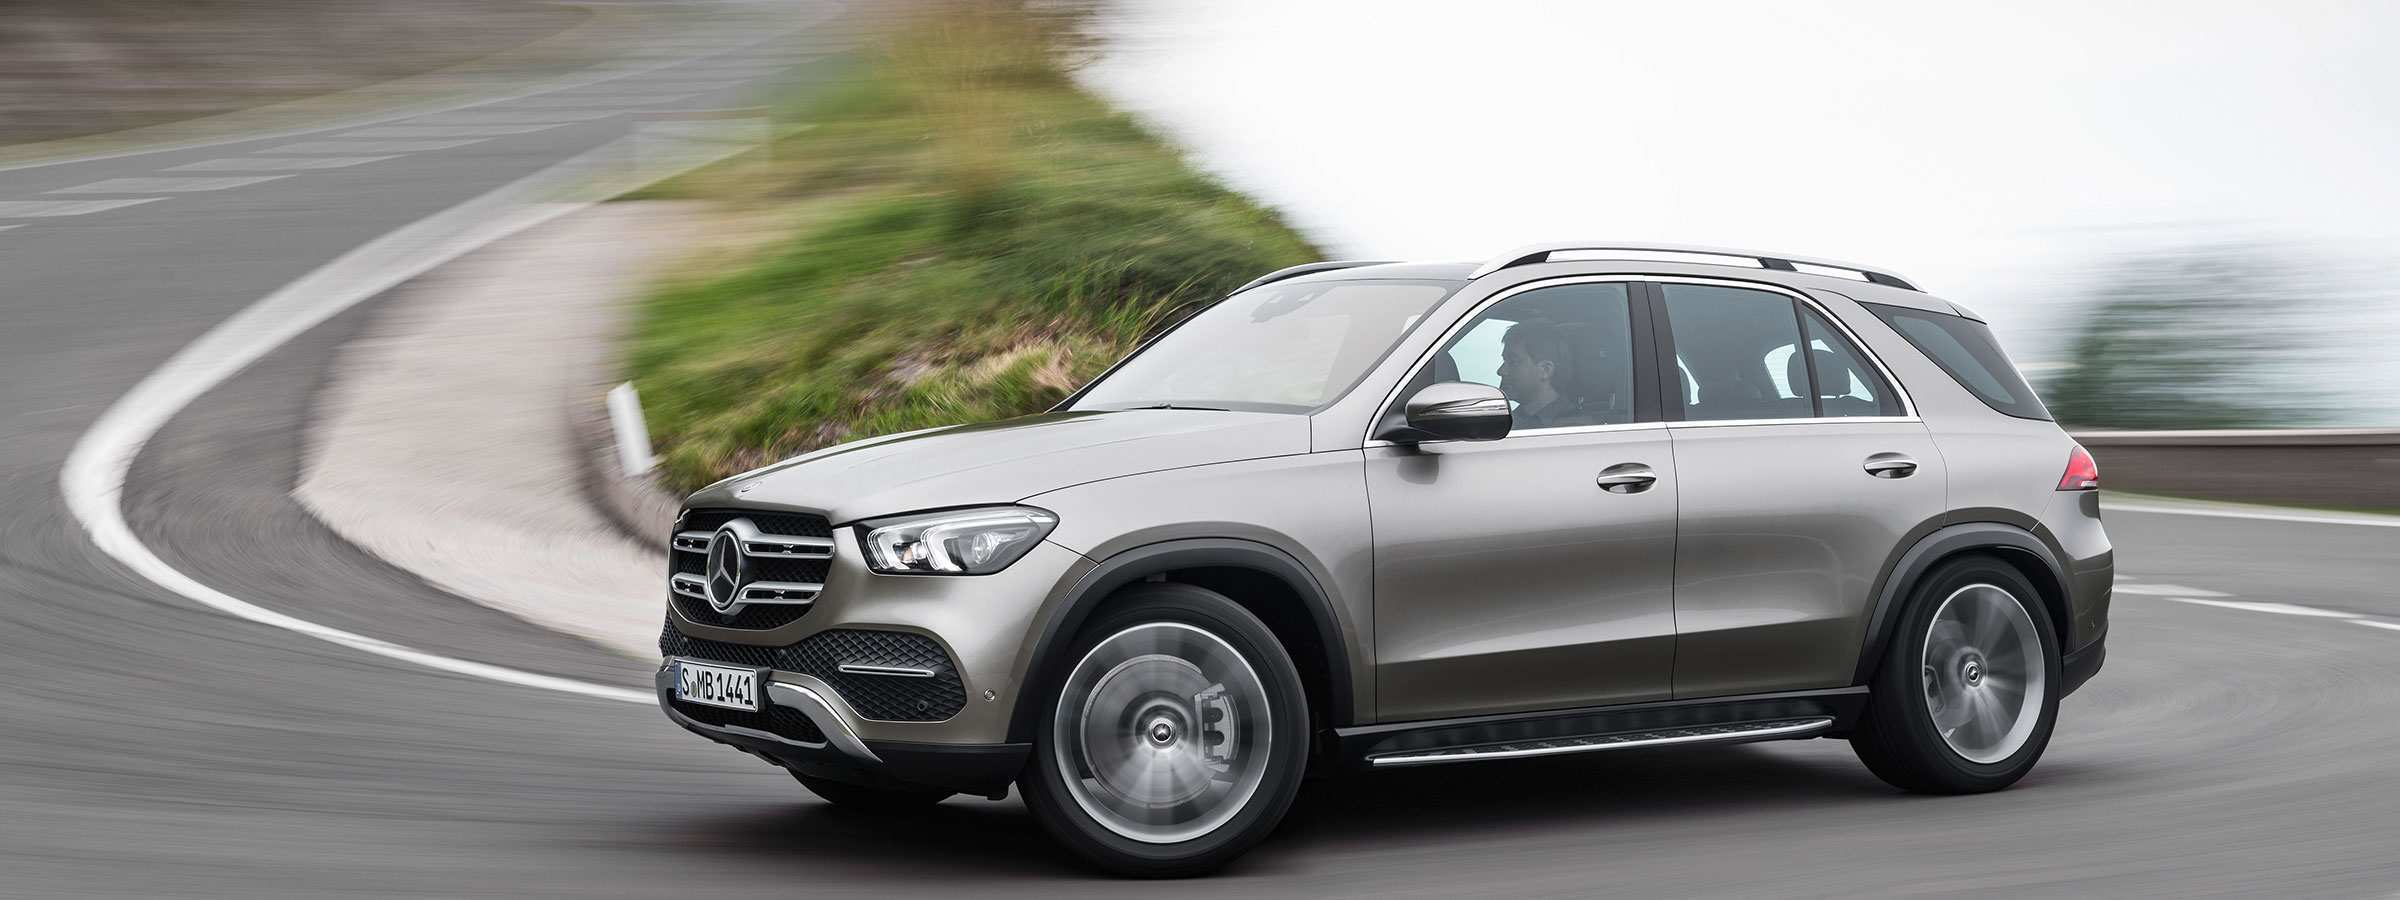 43 New Mercedes 2020 Precio Pictures with Mercedes 2020 Precio